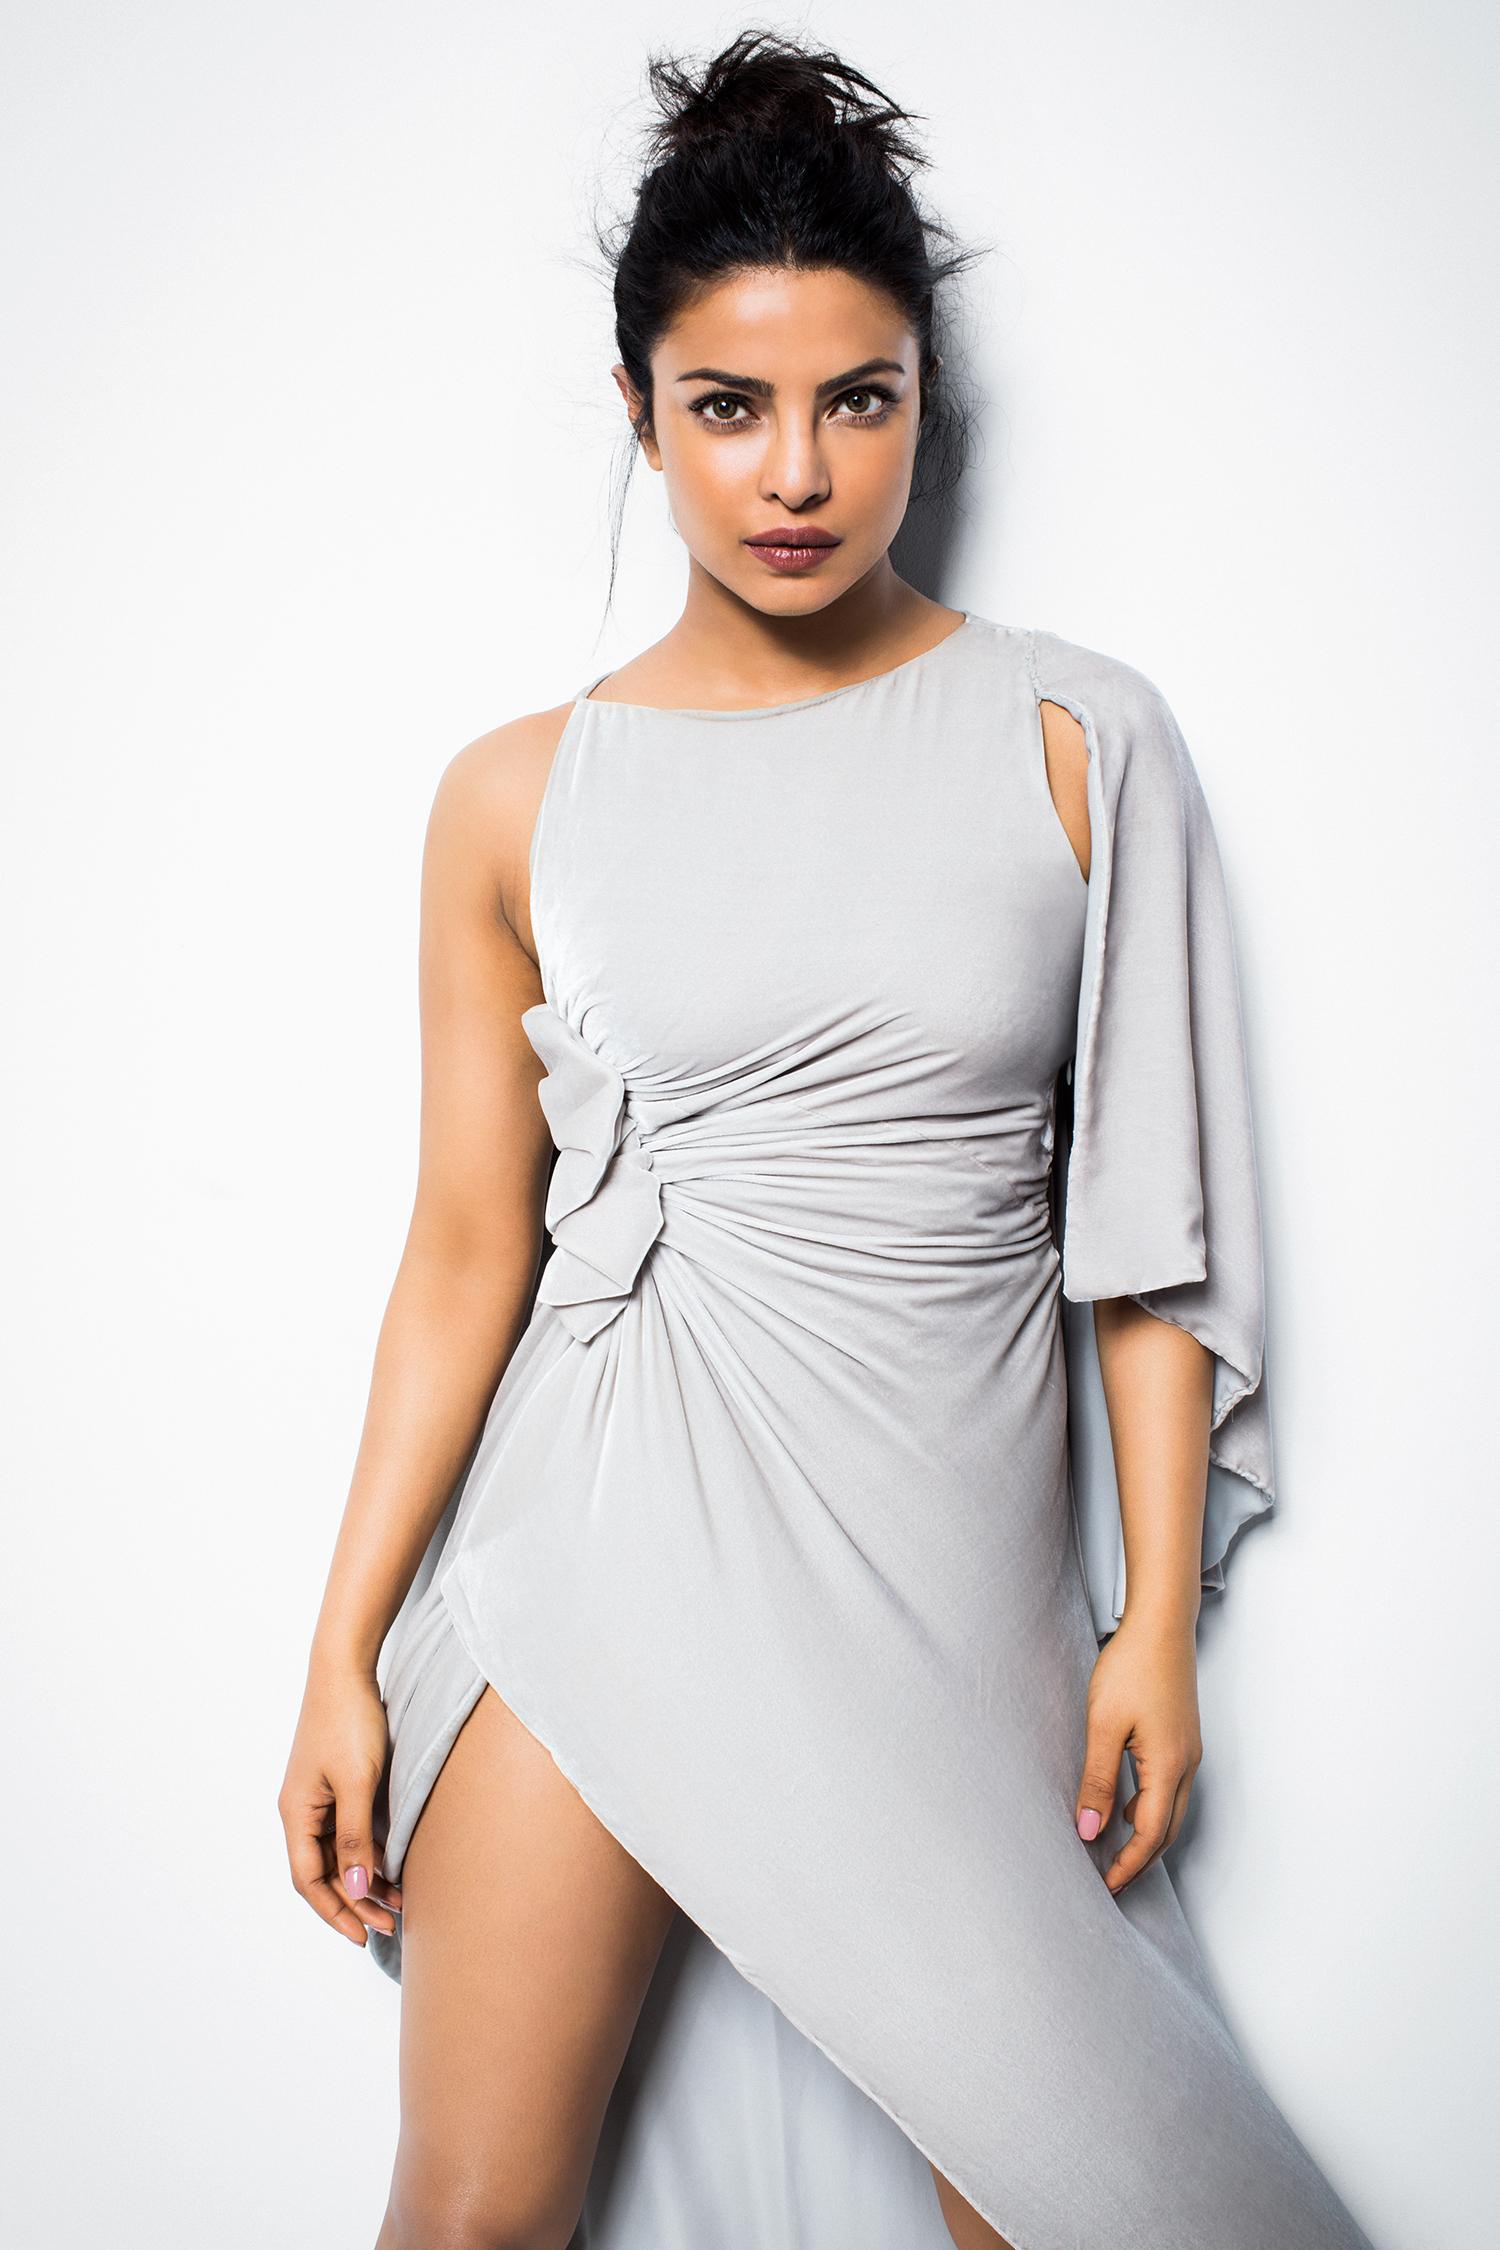 Priyanka Chopra - New York City